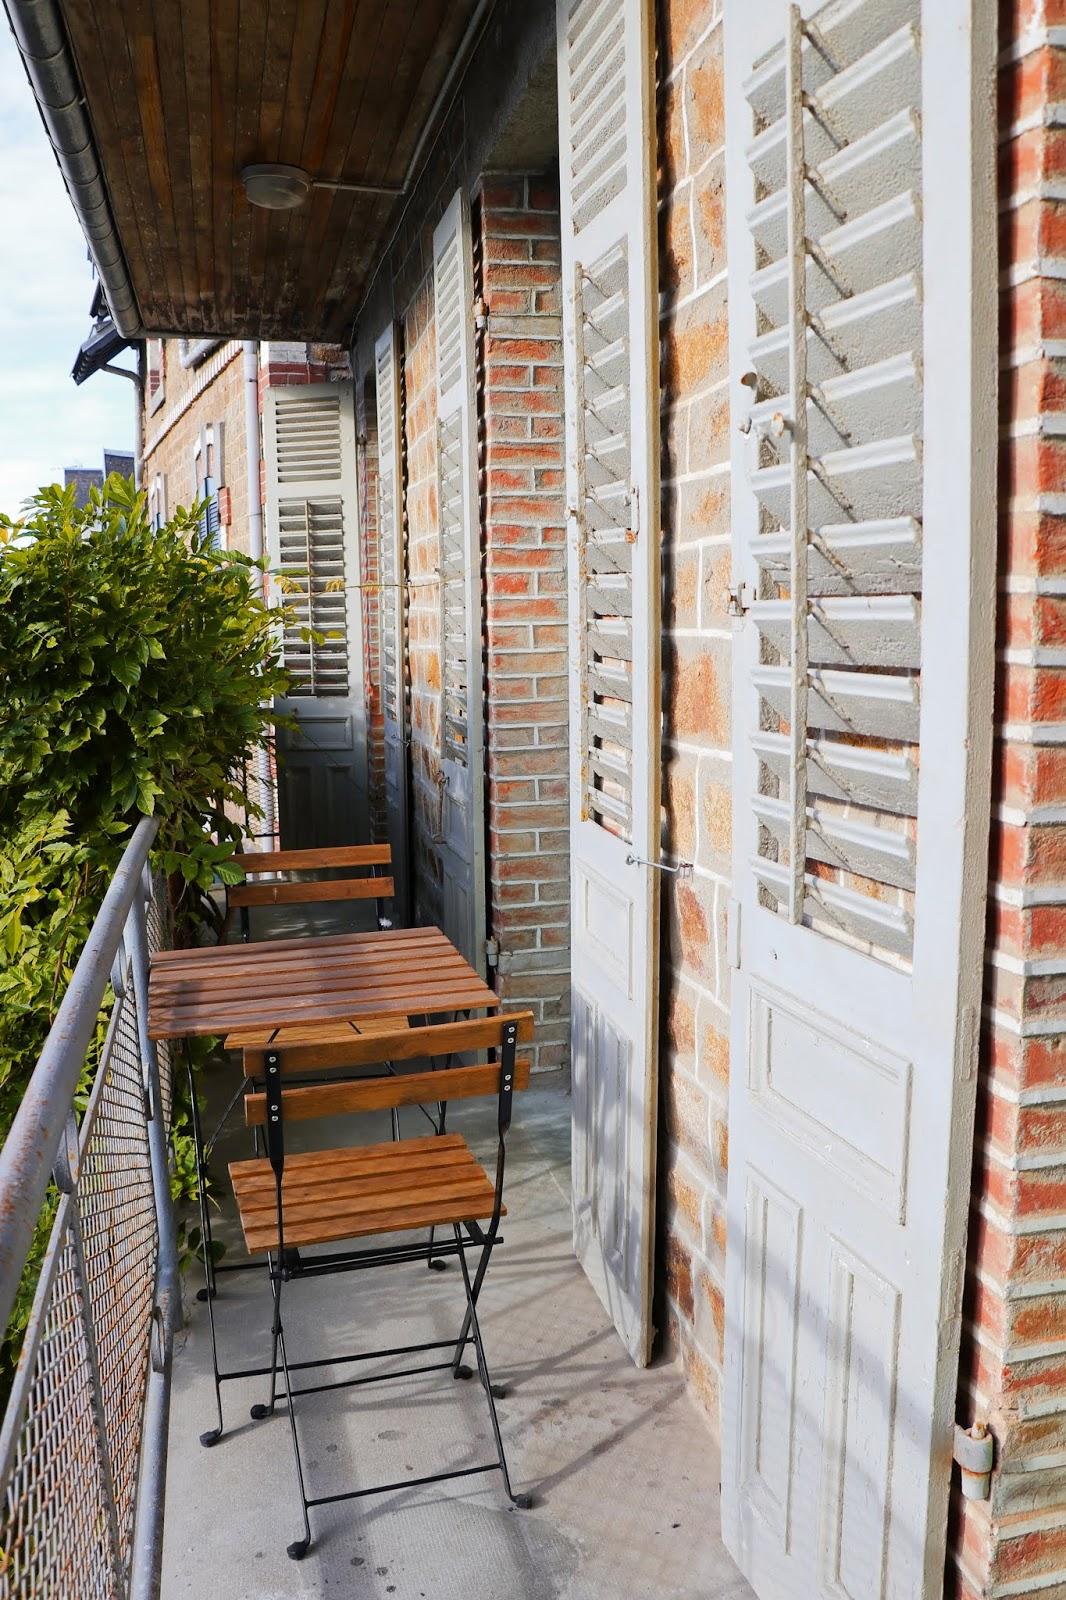 gite les madeleines carolles avis vacances normandie granville airbnb babymoon couple terrasse